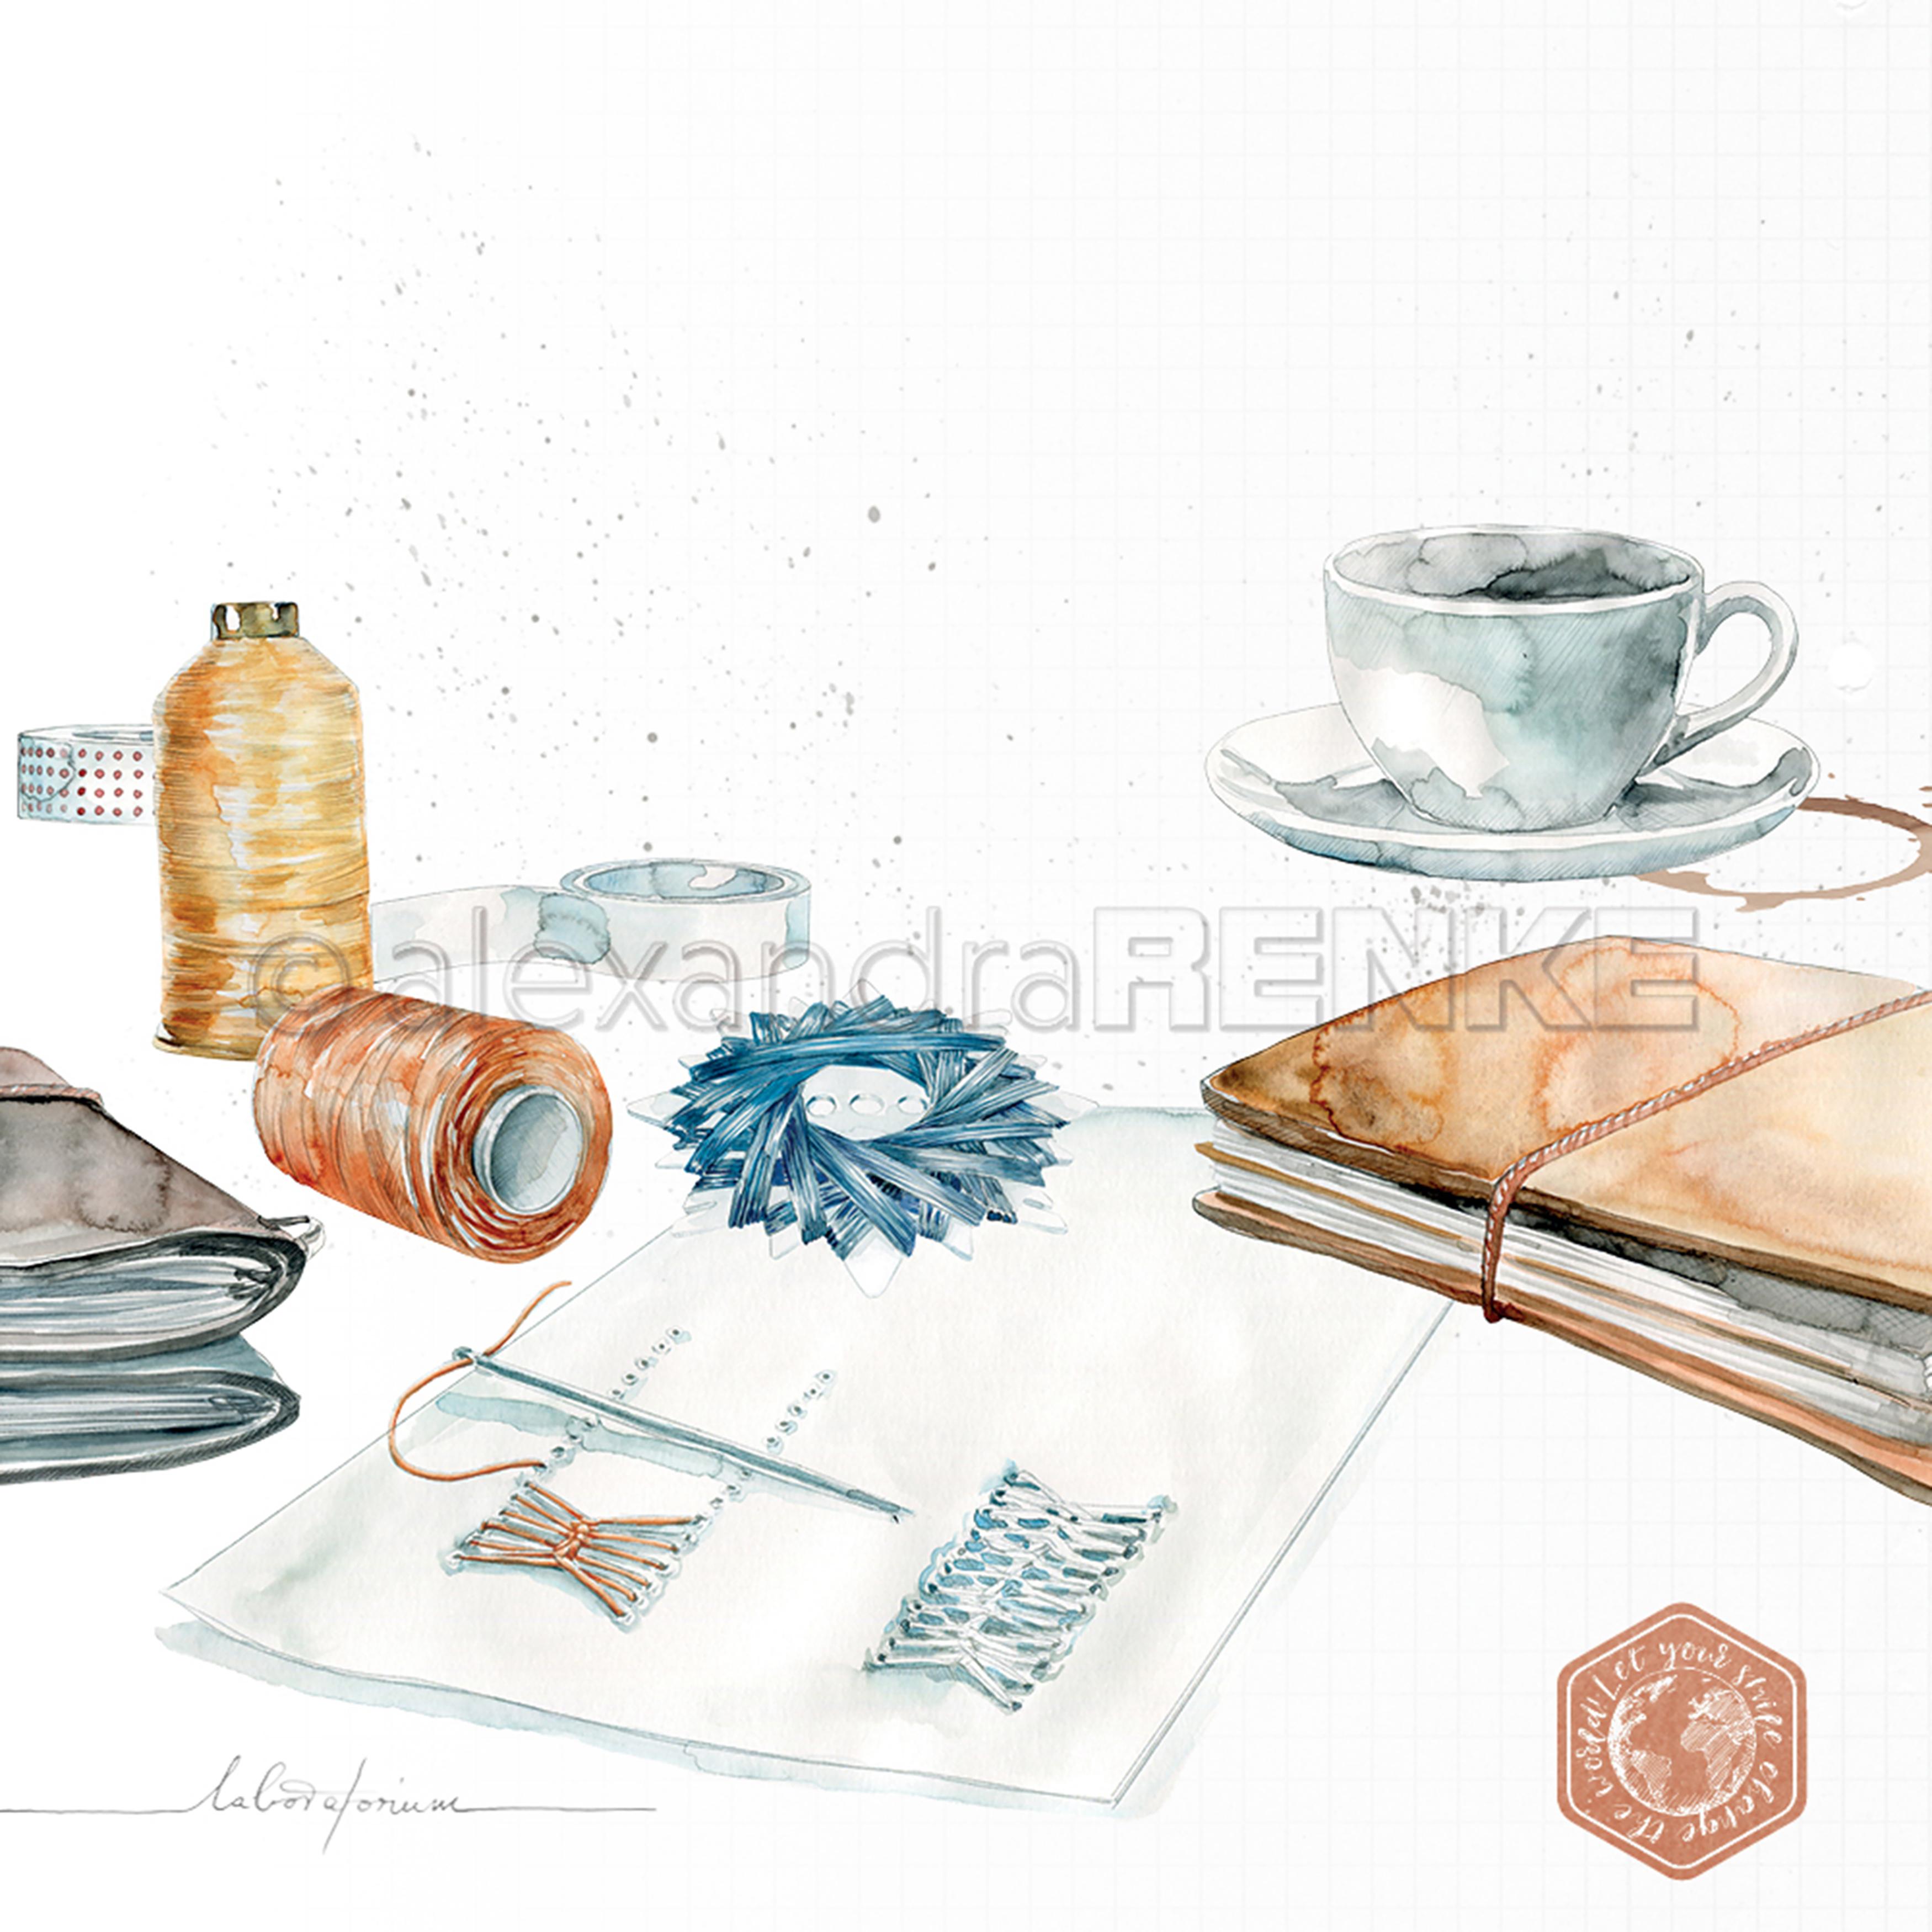 Alexandra Renke Midori Basic Design Paper 12X12-Crafts